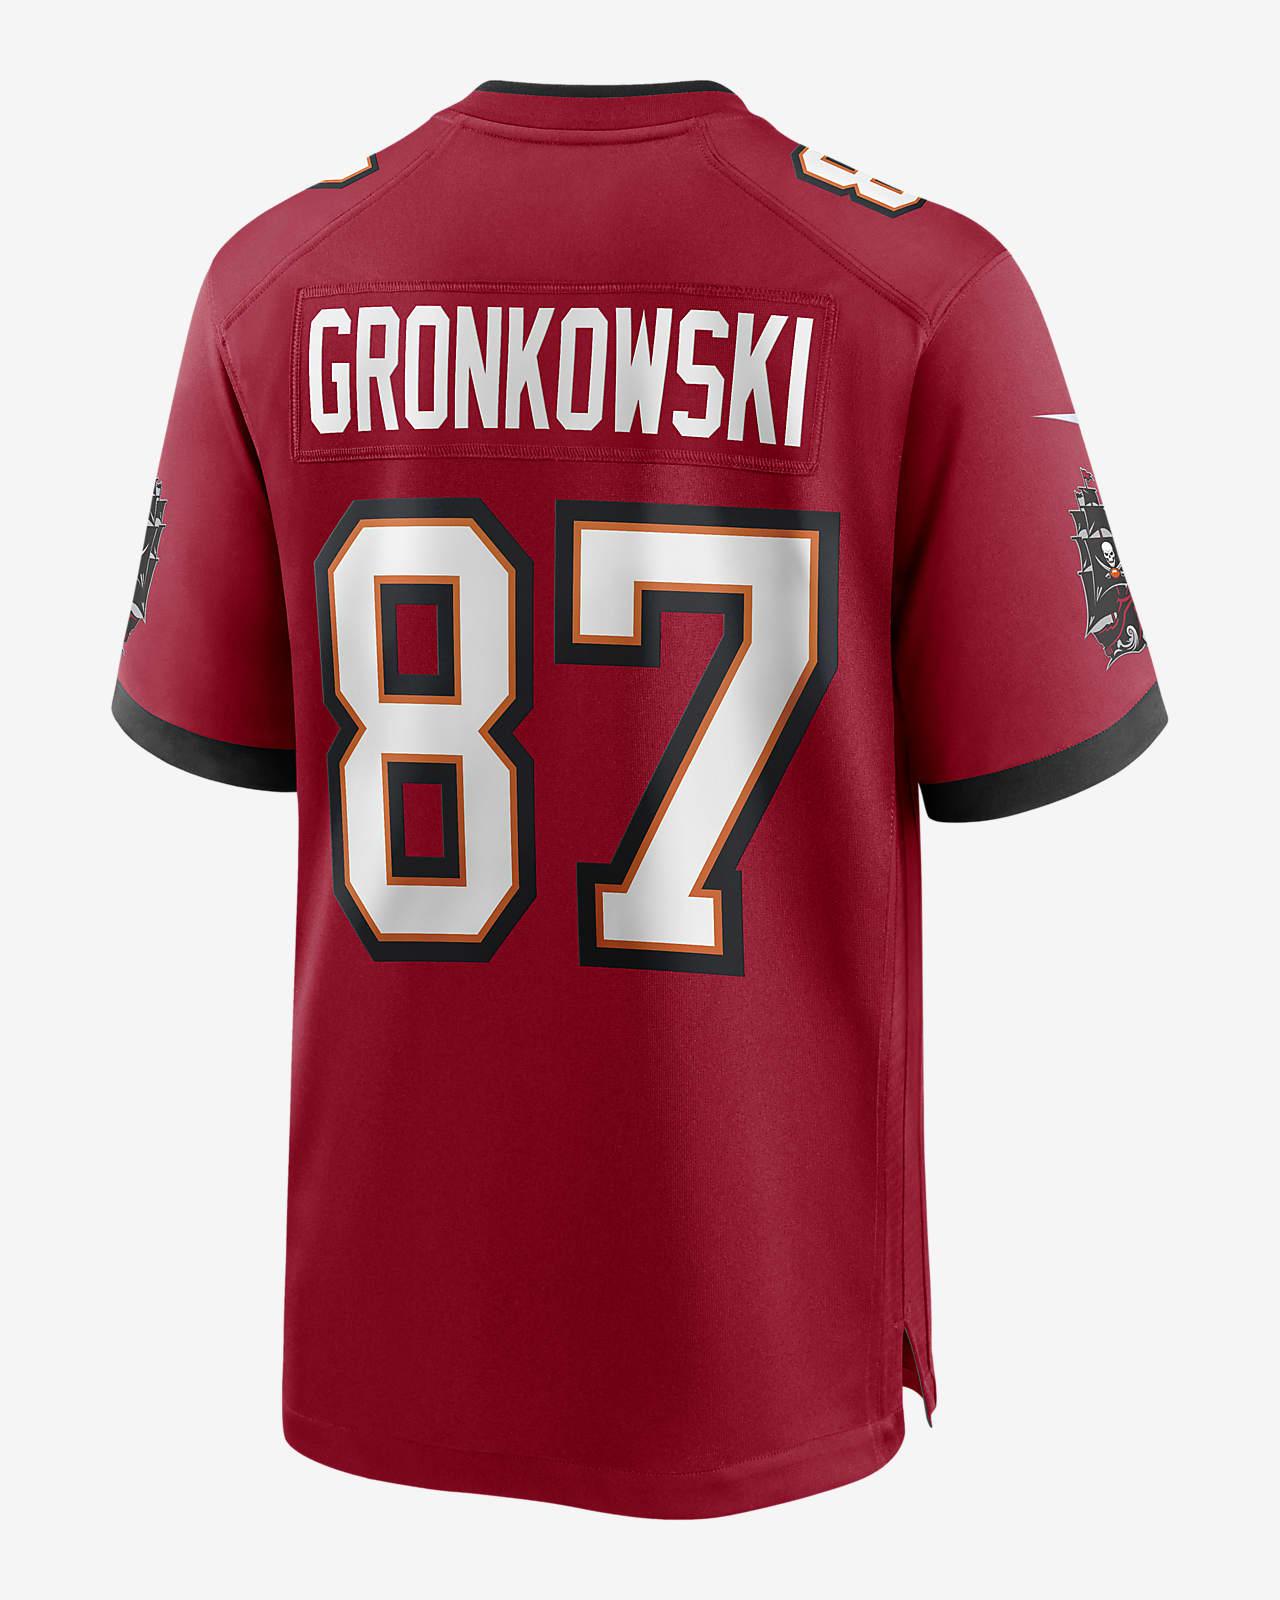 NFL Tampa Bay Buccaneers (Rob Gronkowski) Men's Game Jersey